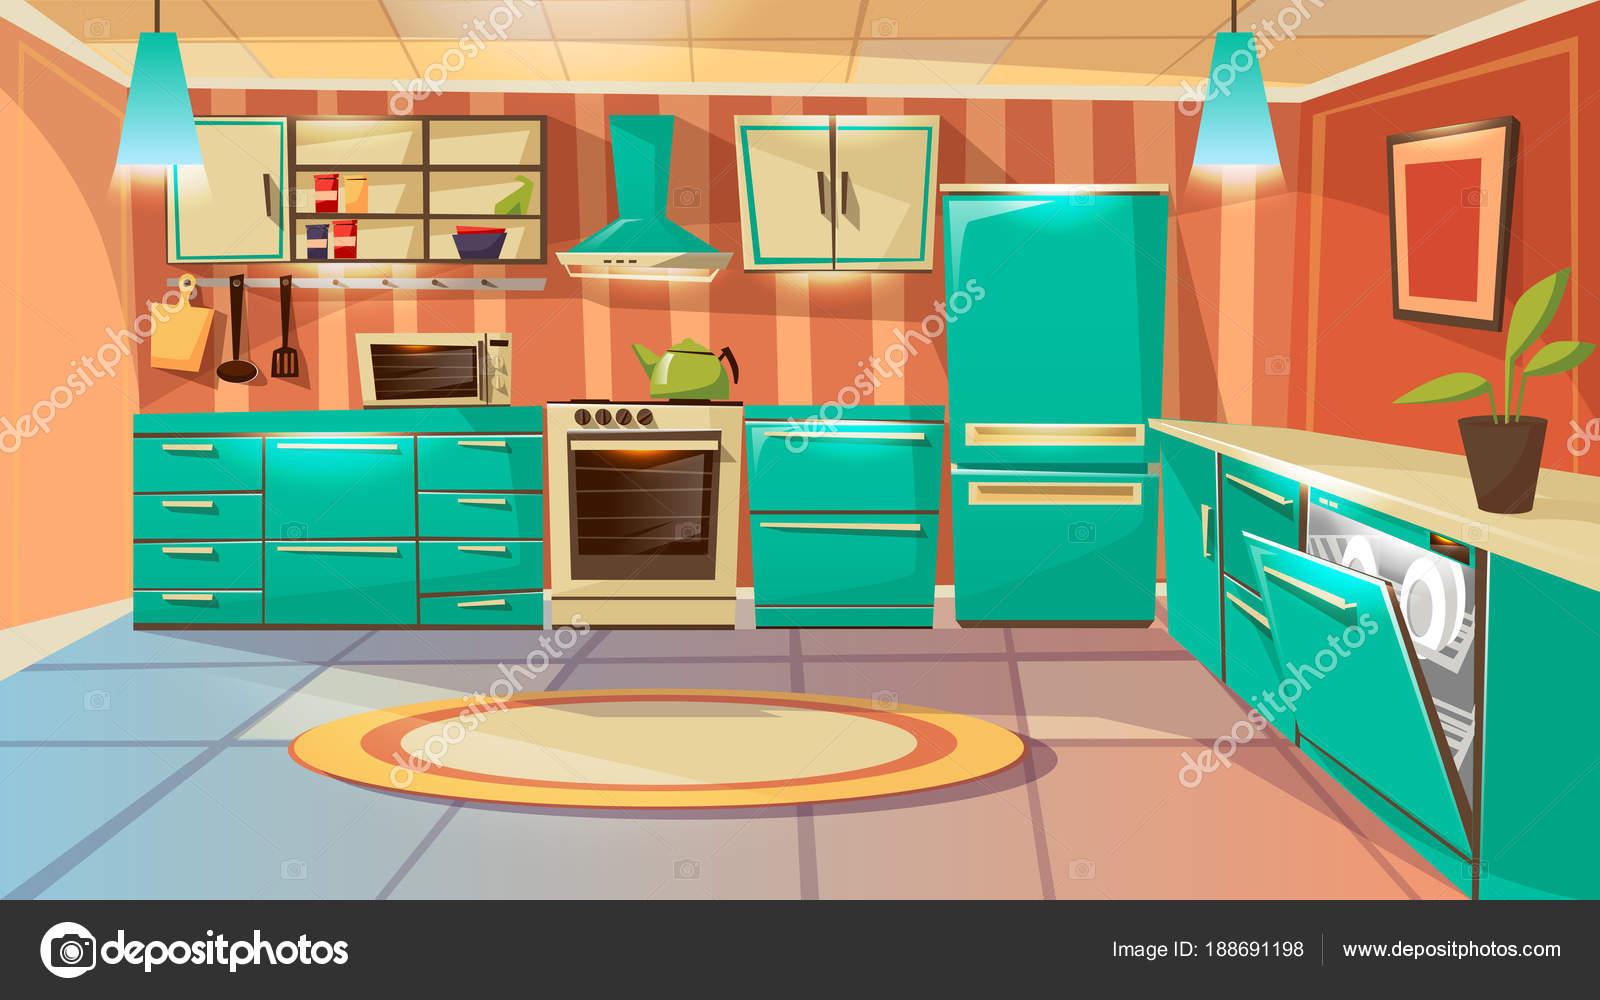 Foto cocina animada fondo interior de cocina de dibujos animados de vector vector de stock - Dibujos de cocina ...